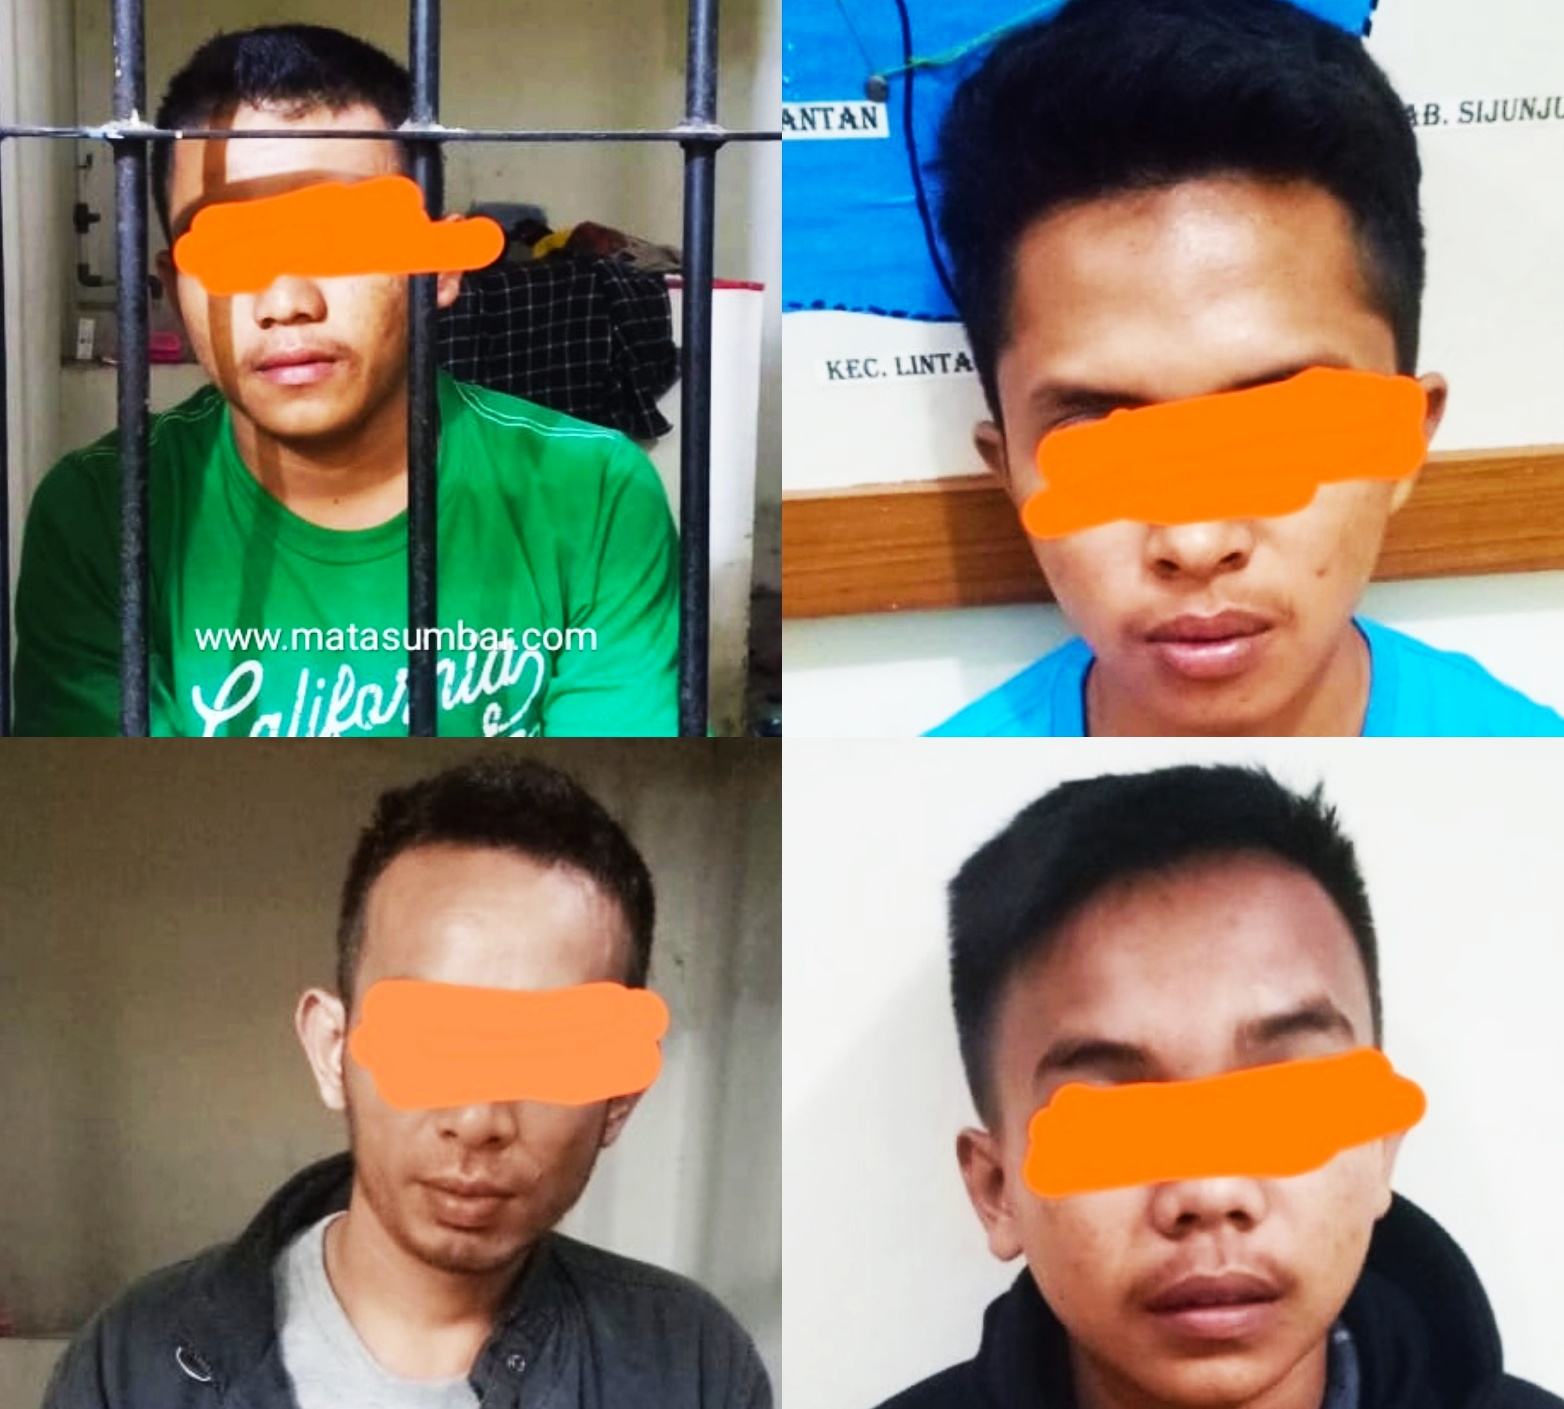 Polres Tanah Datar Ringkus 4 Orang Pelaku Pemerkosaan, Satu Orang Masih Diburu